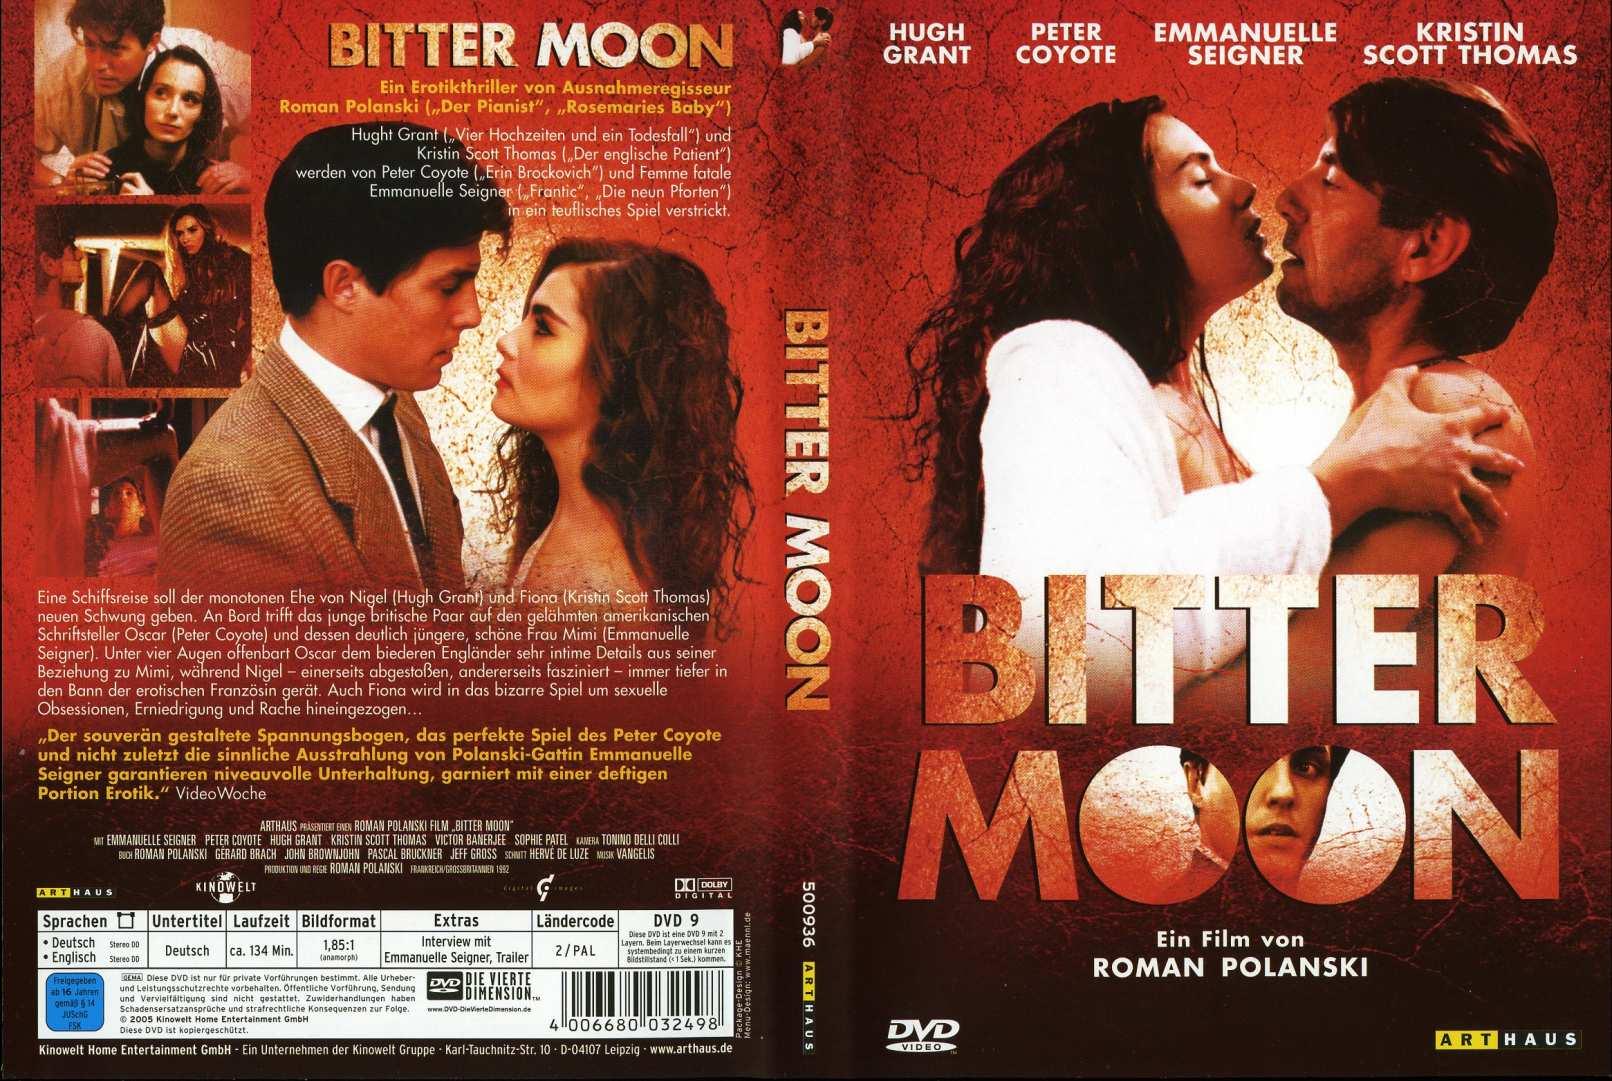 Bitter Moon German Front Back